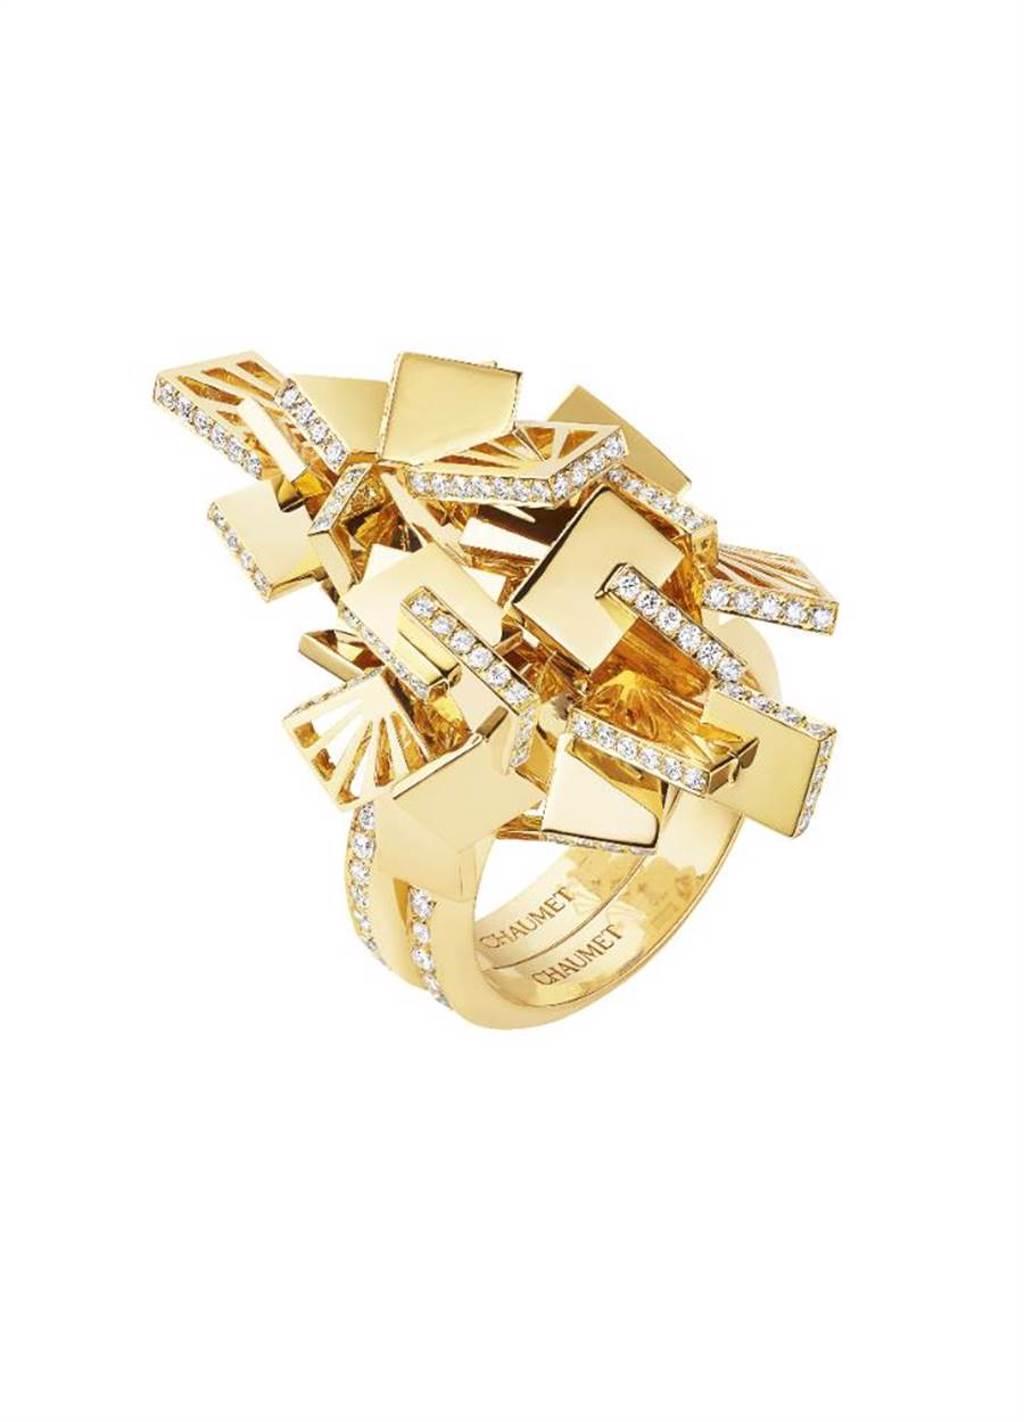 CHAUMET Perspectives de Chaumet系列Skyline可轉換式18K黃金戒指,靈感源自都市林立交錯的摩天大樓,約450萬元。( CHAUMET提供)